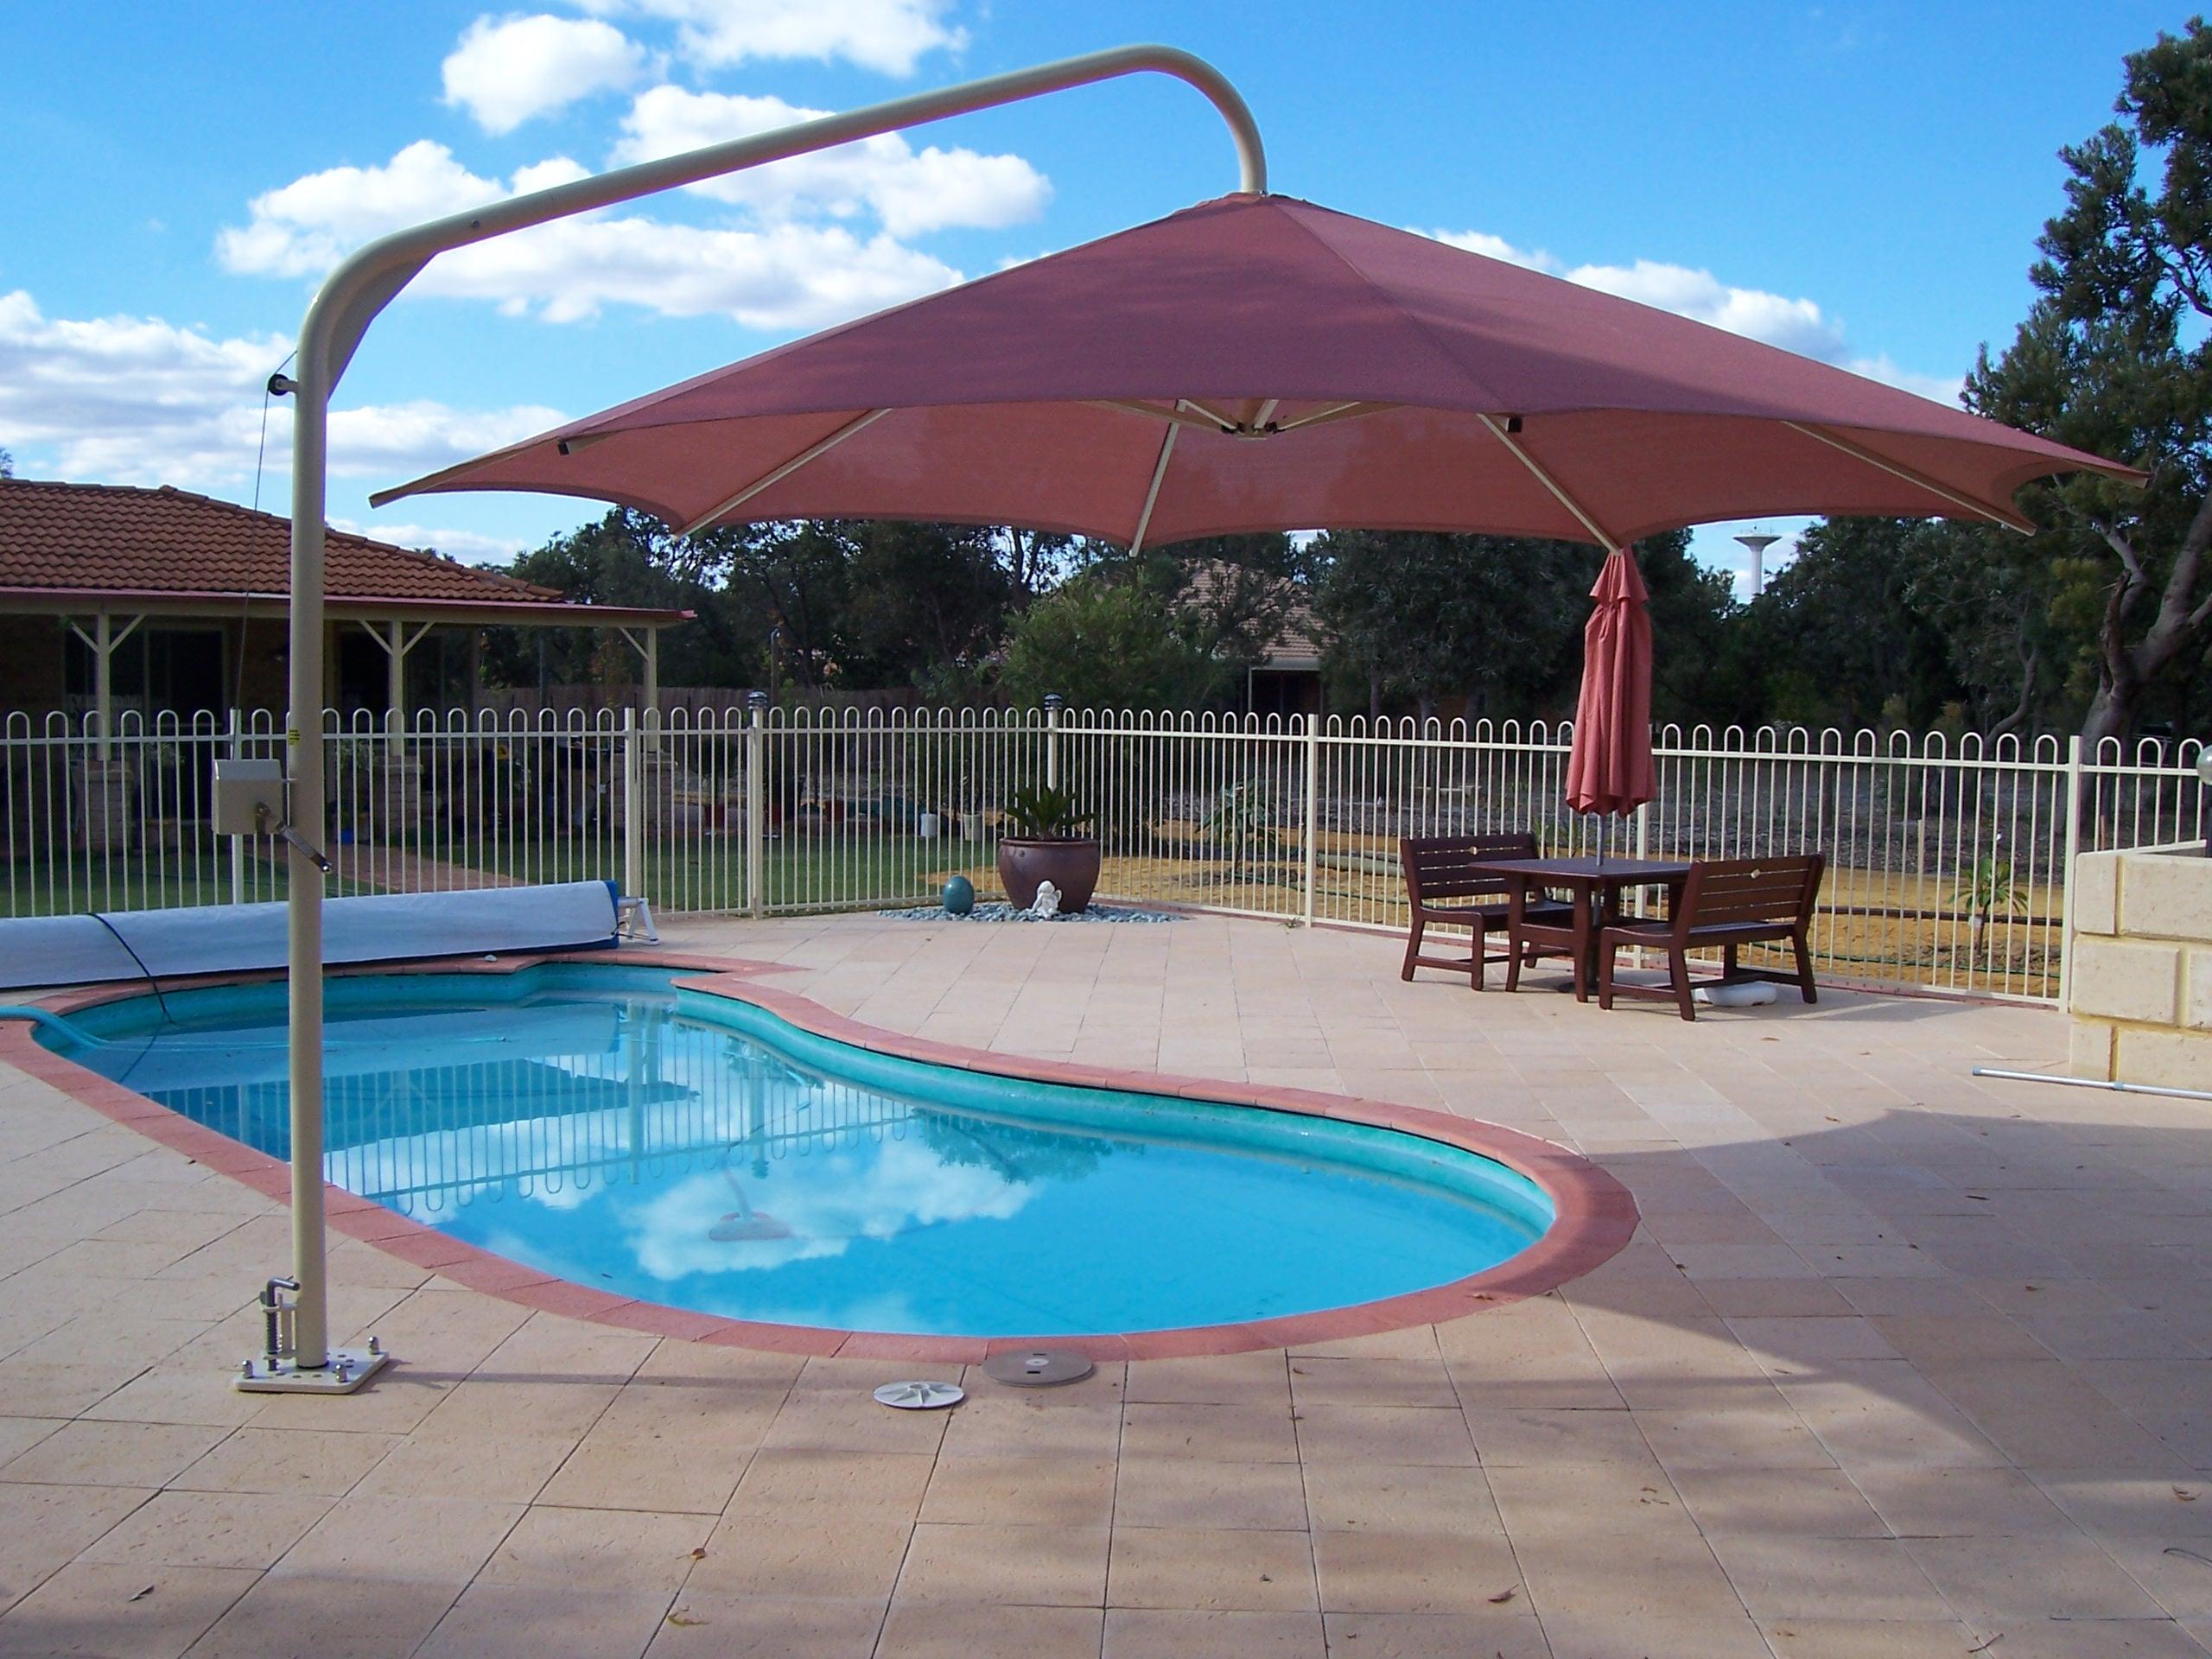 Umbrella Over Sandpit Photo S 004 100 0754